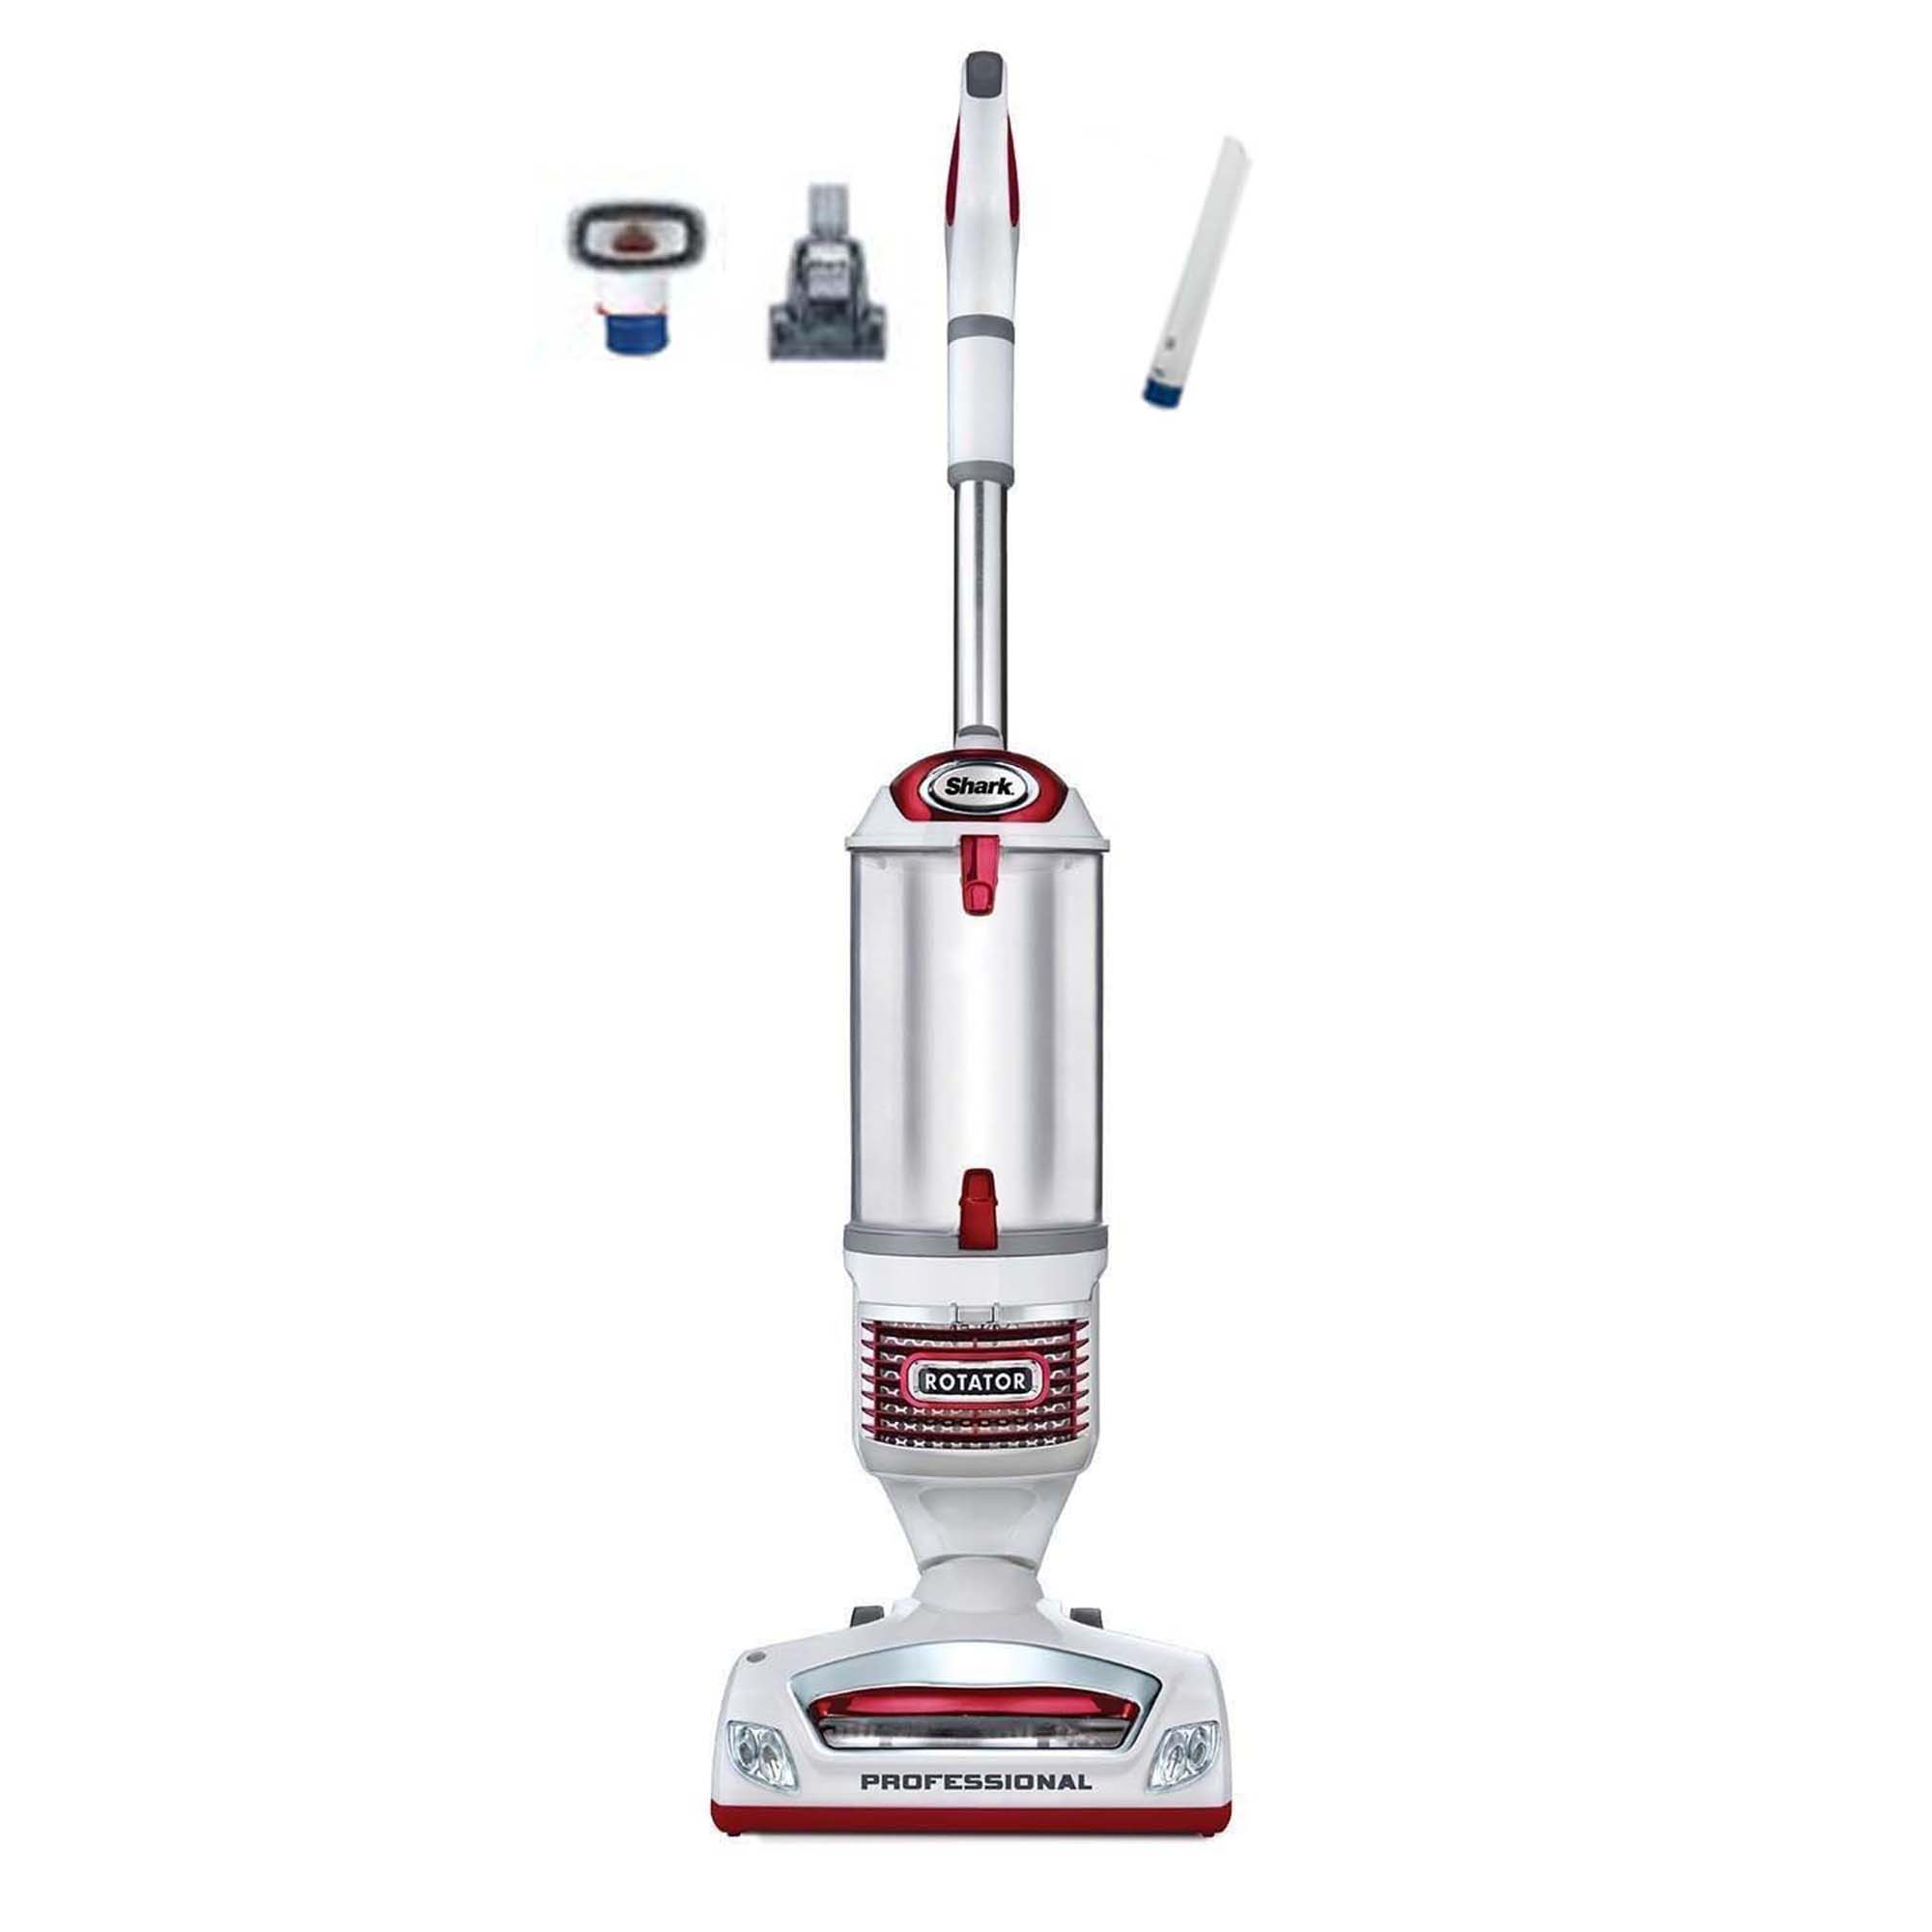 Shark Nv500 3 In 1 Rotator Professional Lift Away Vacuum